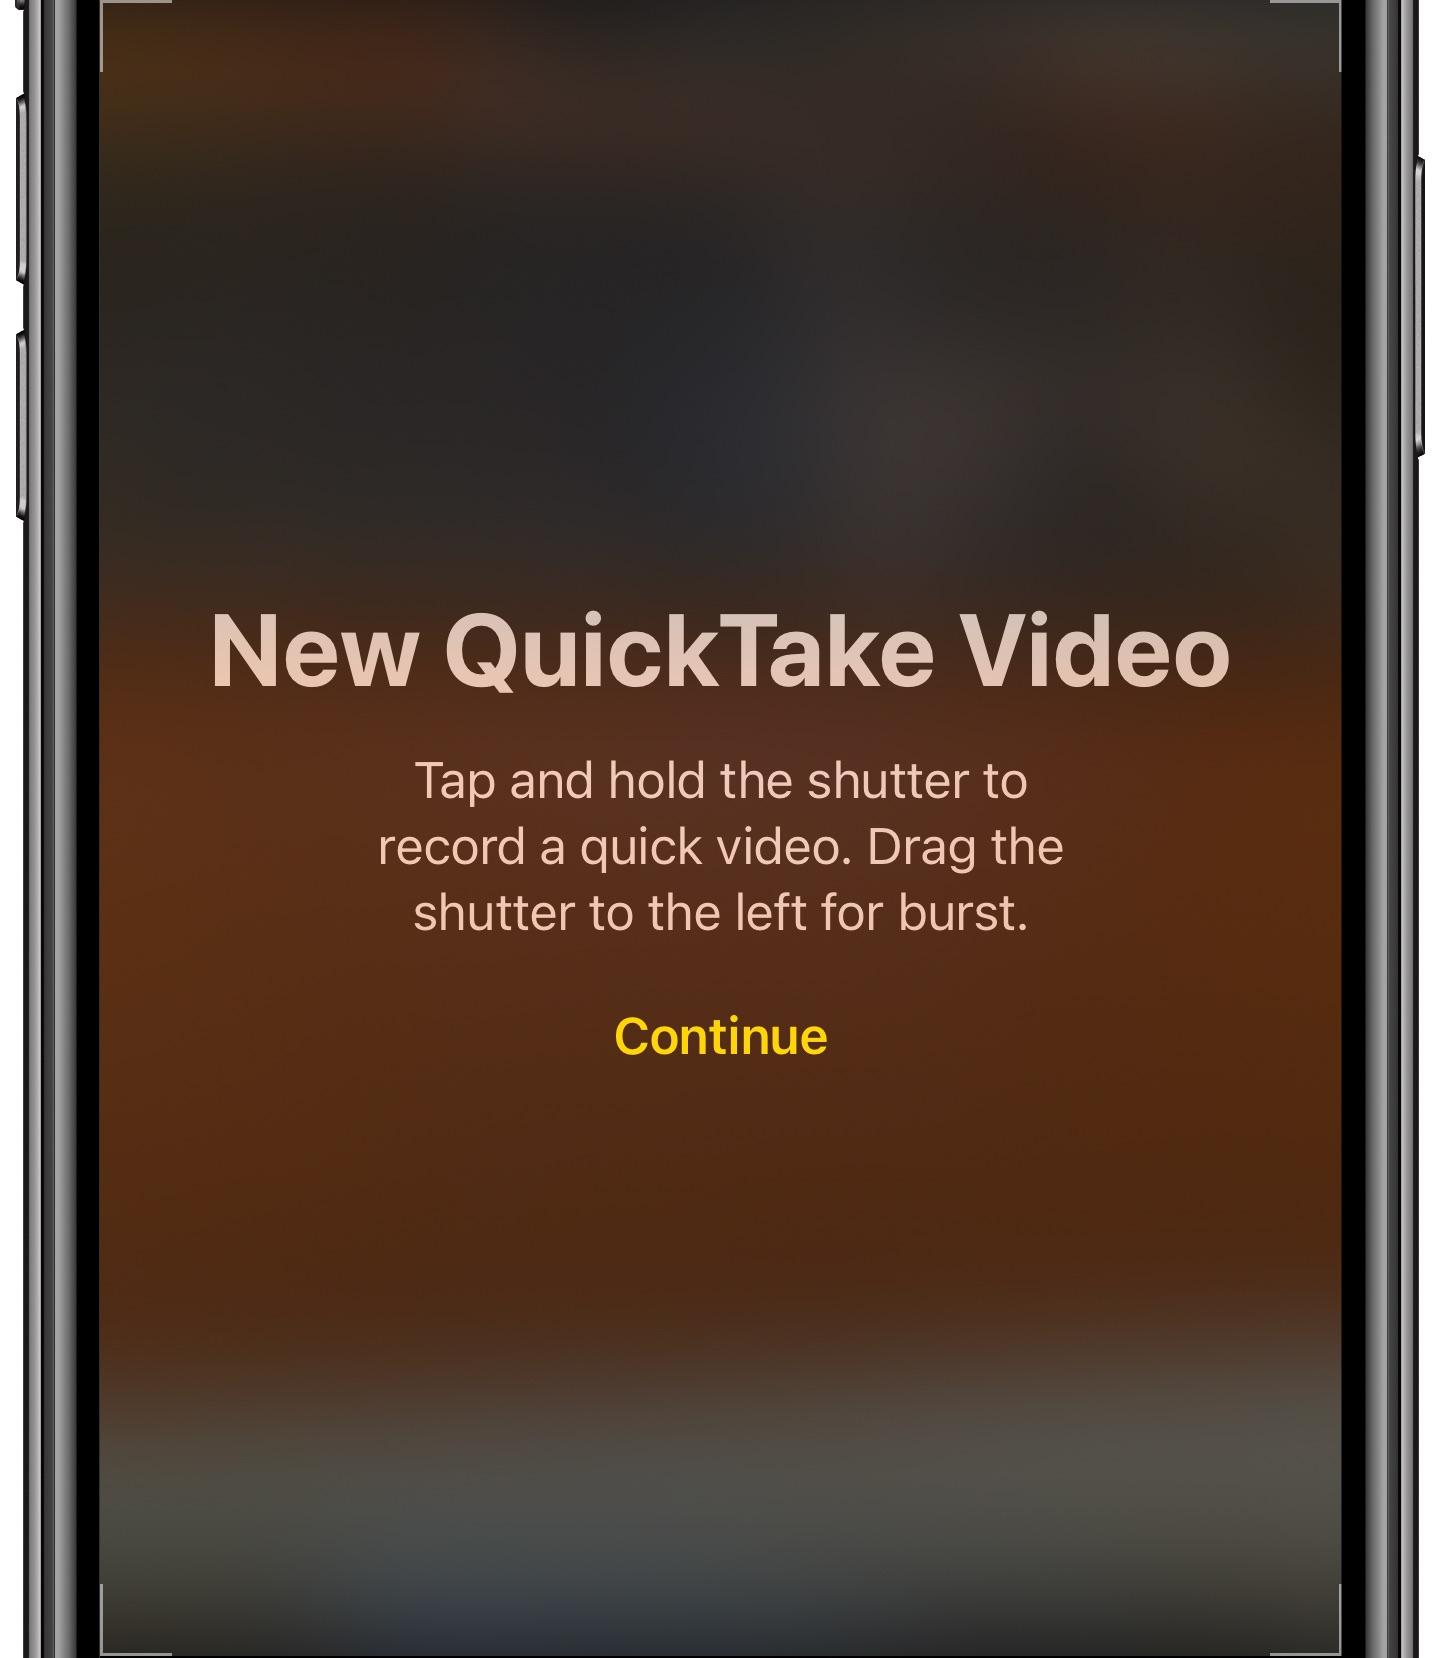 QuickTake video - iPhone camera splash screen